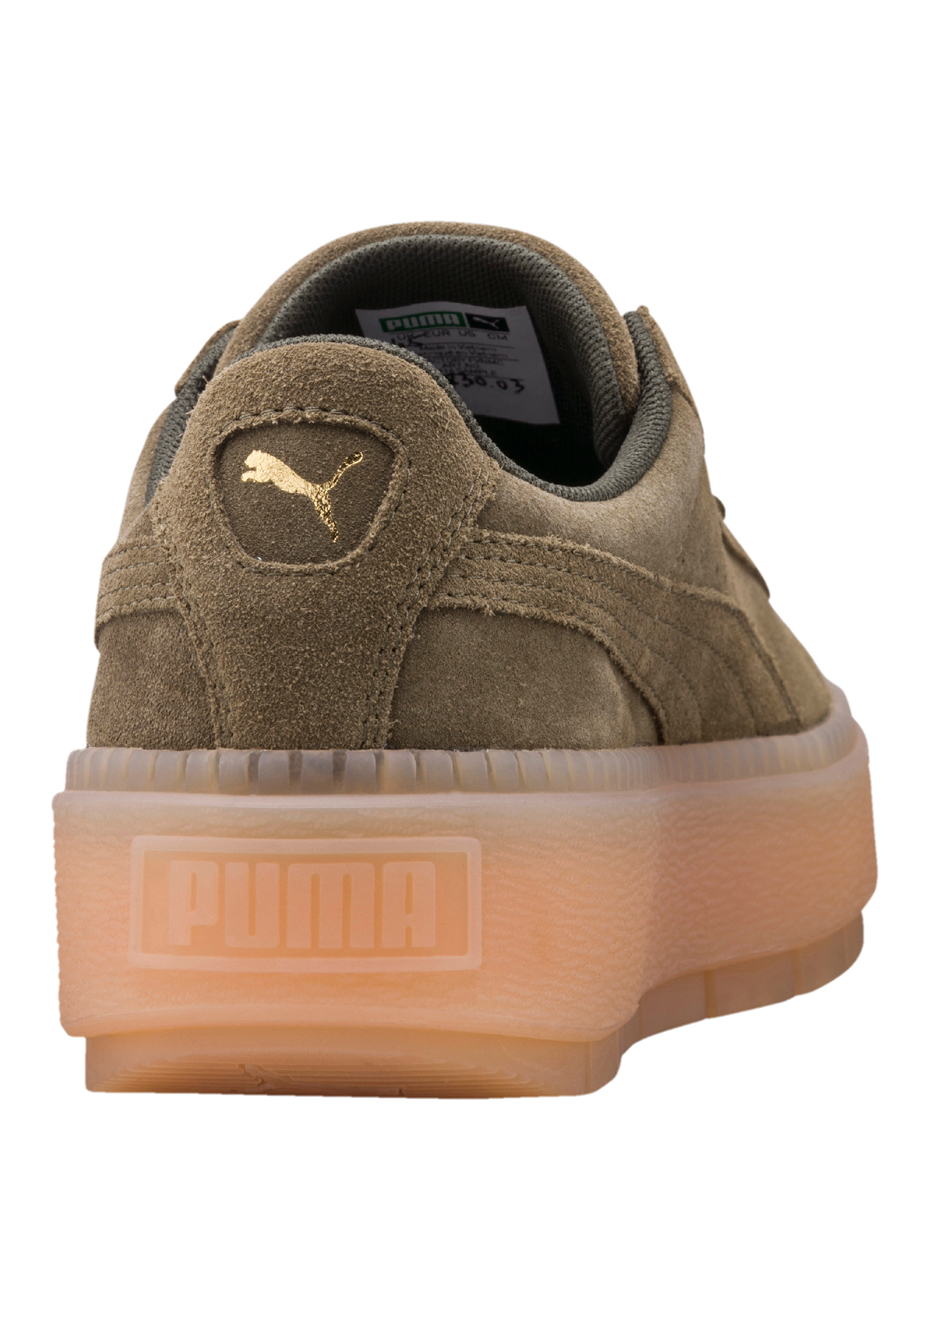 Puma Basket Classic Waterproof Sneaker Olive Classic Puma